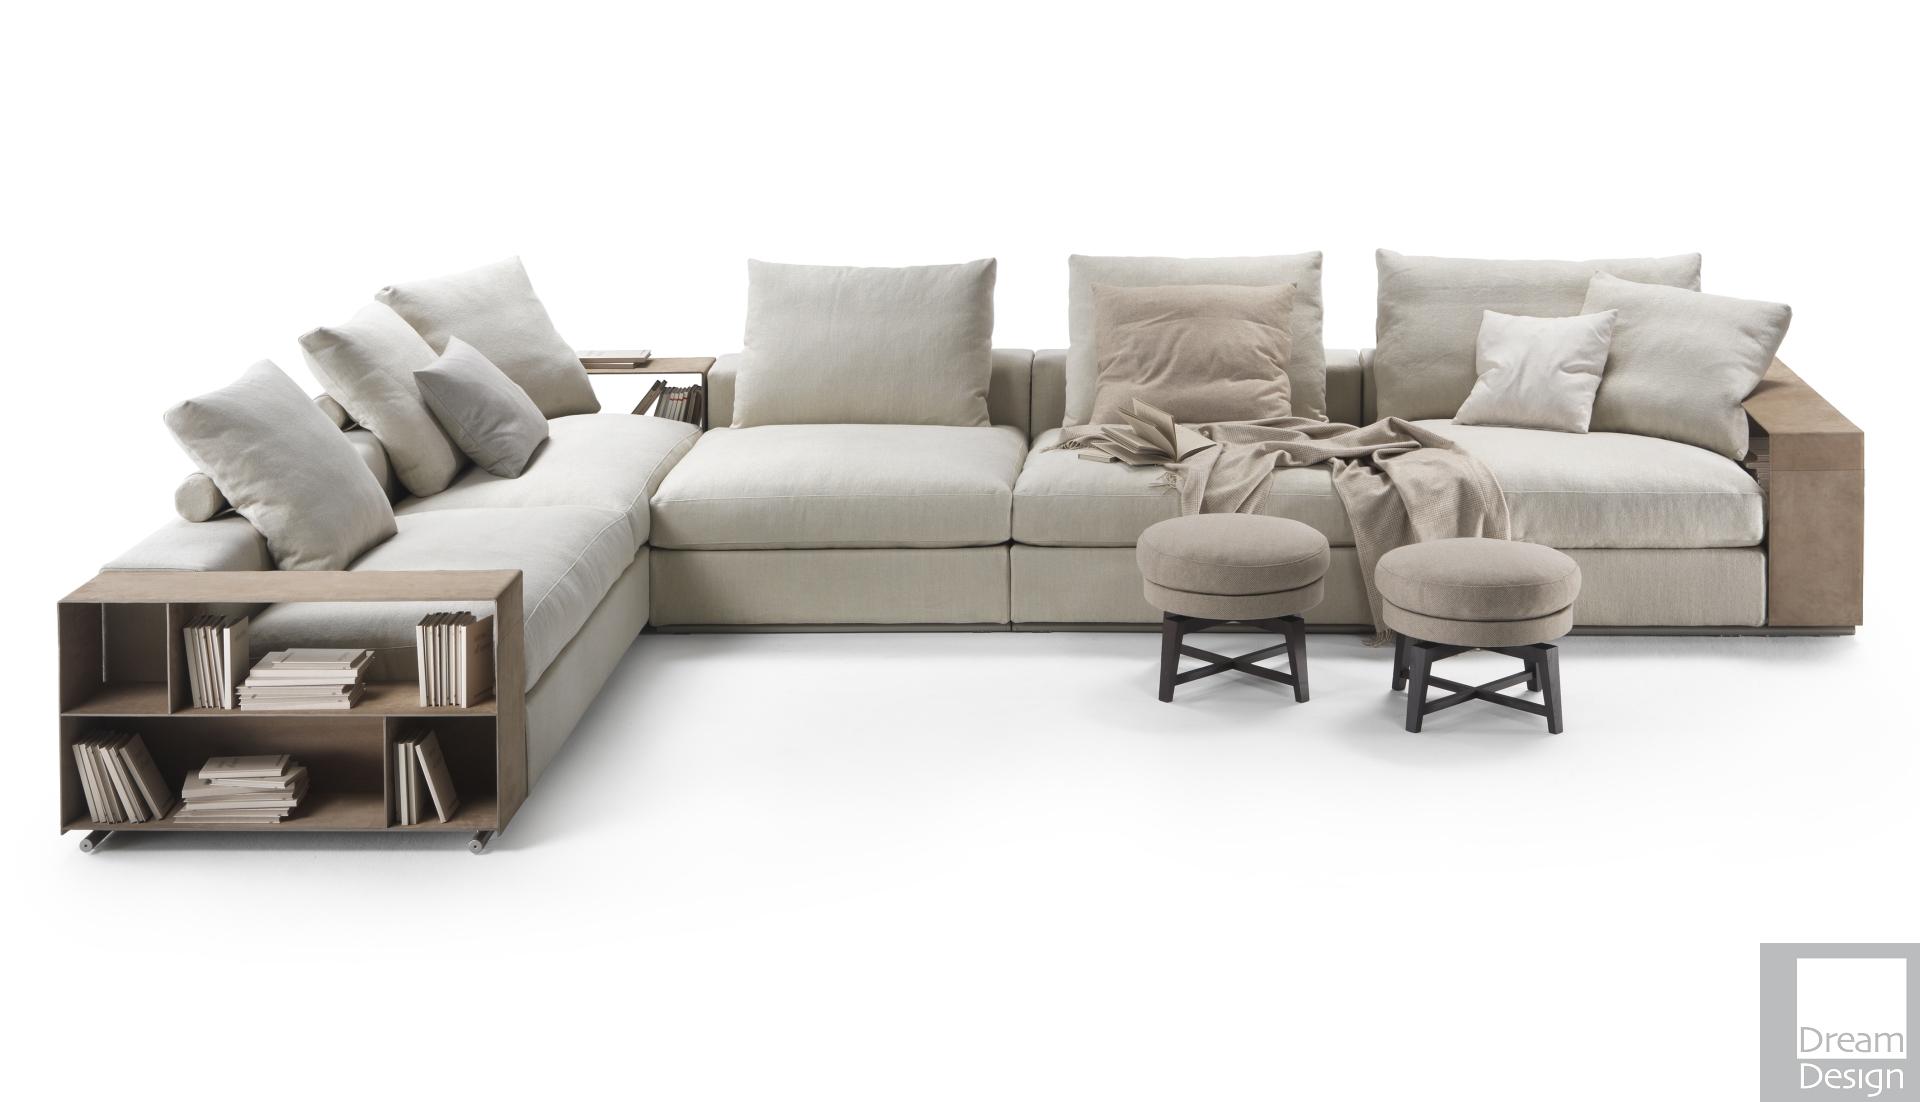 Flexform Groundpiece Modular Sofa – Dream Design Interiors Ltd In Dream Navy 2 Piece Modular Sofas (View 2 of 15)